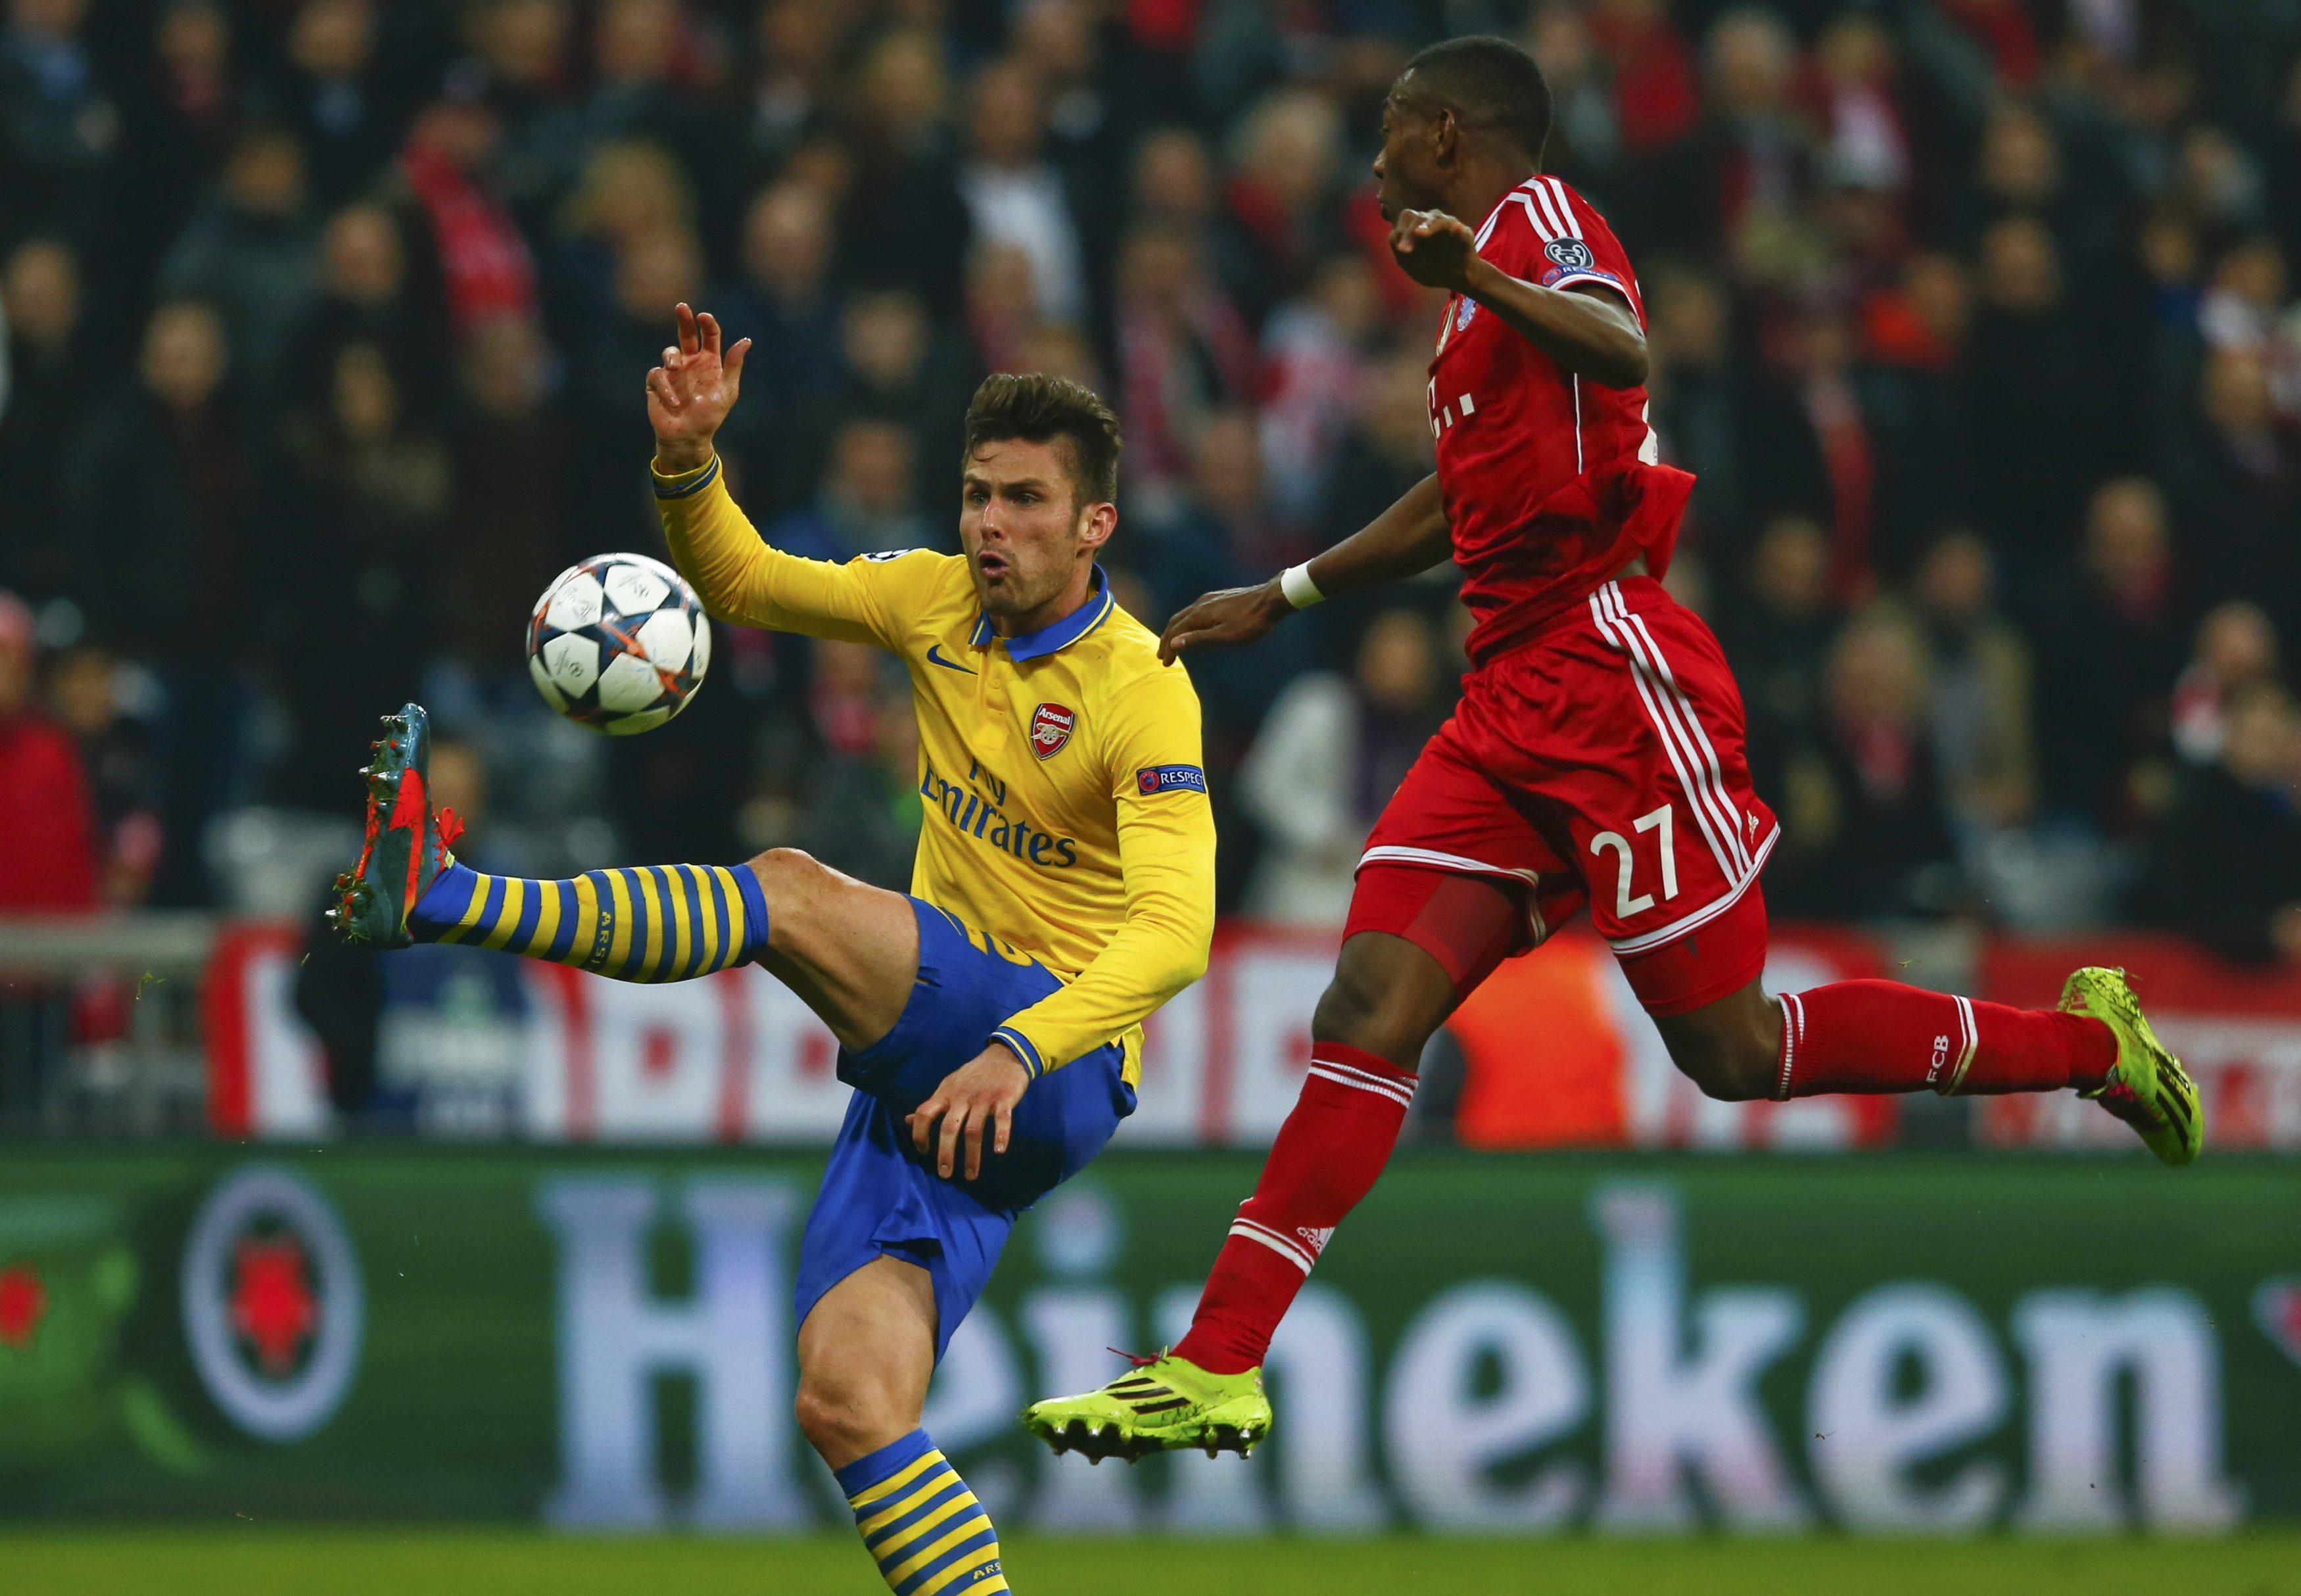 Holders Bayern progress despite shaky second half